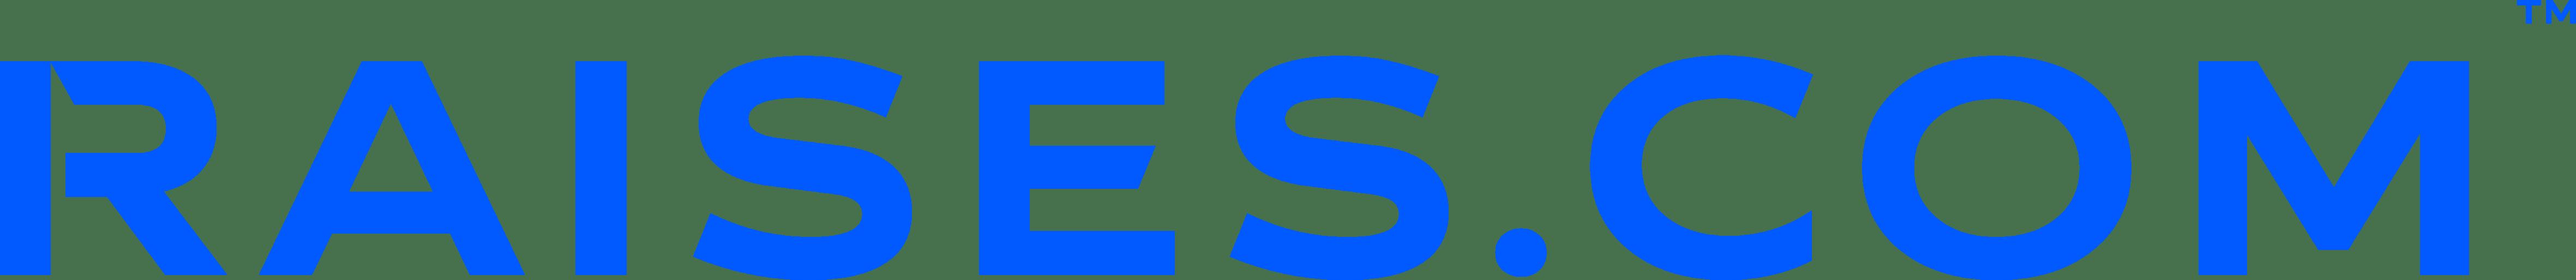 Raises.com™ - Raise $1m-$100m - Global Investment Banking